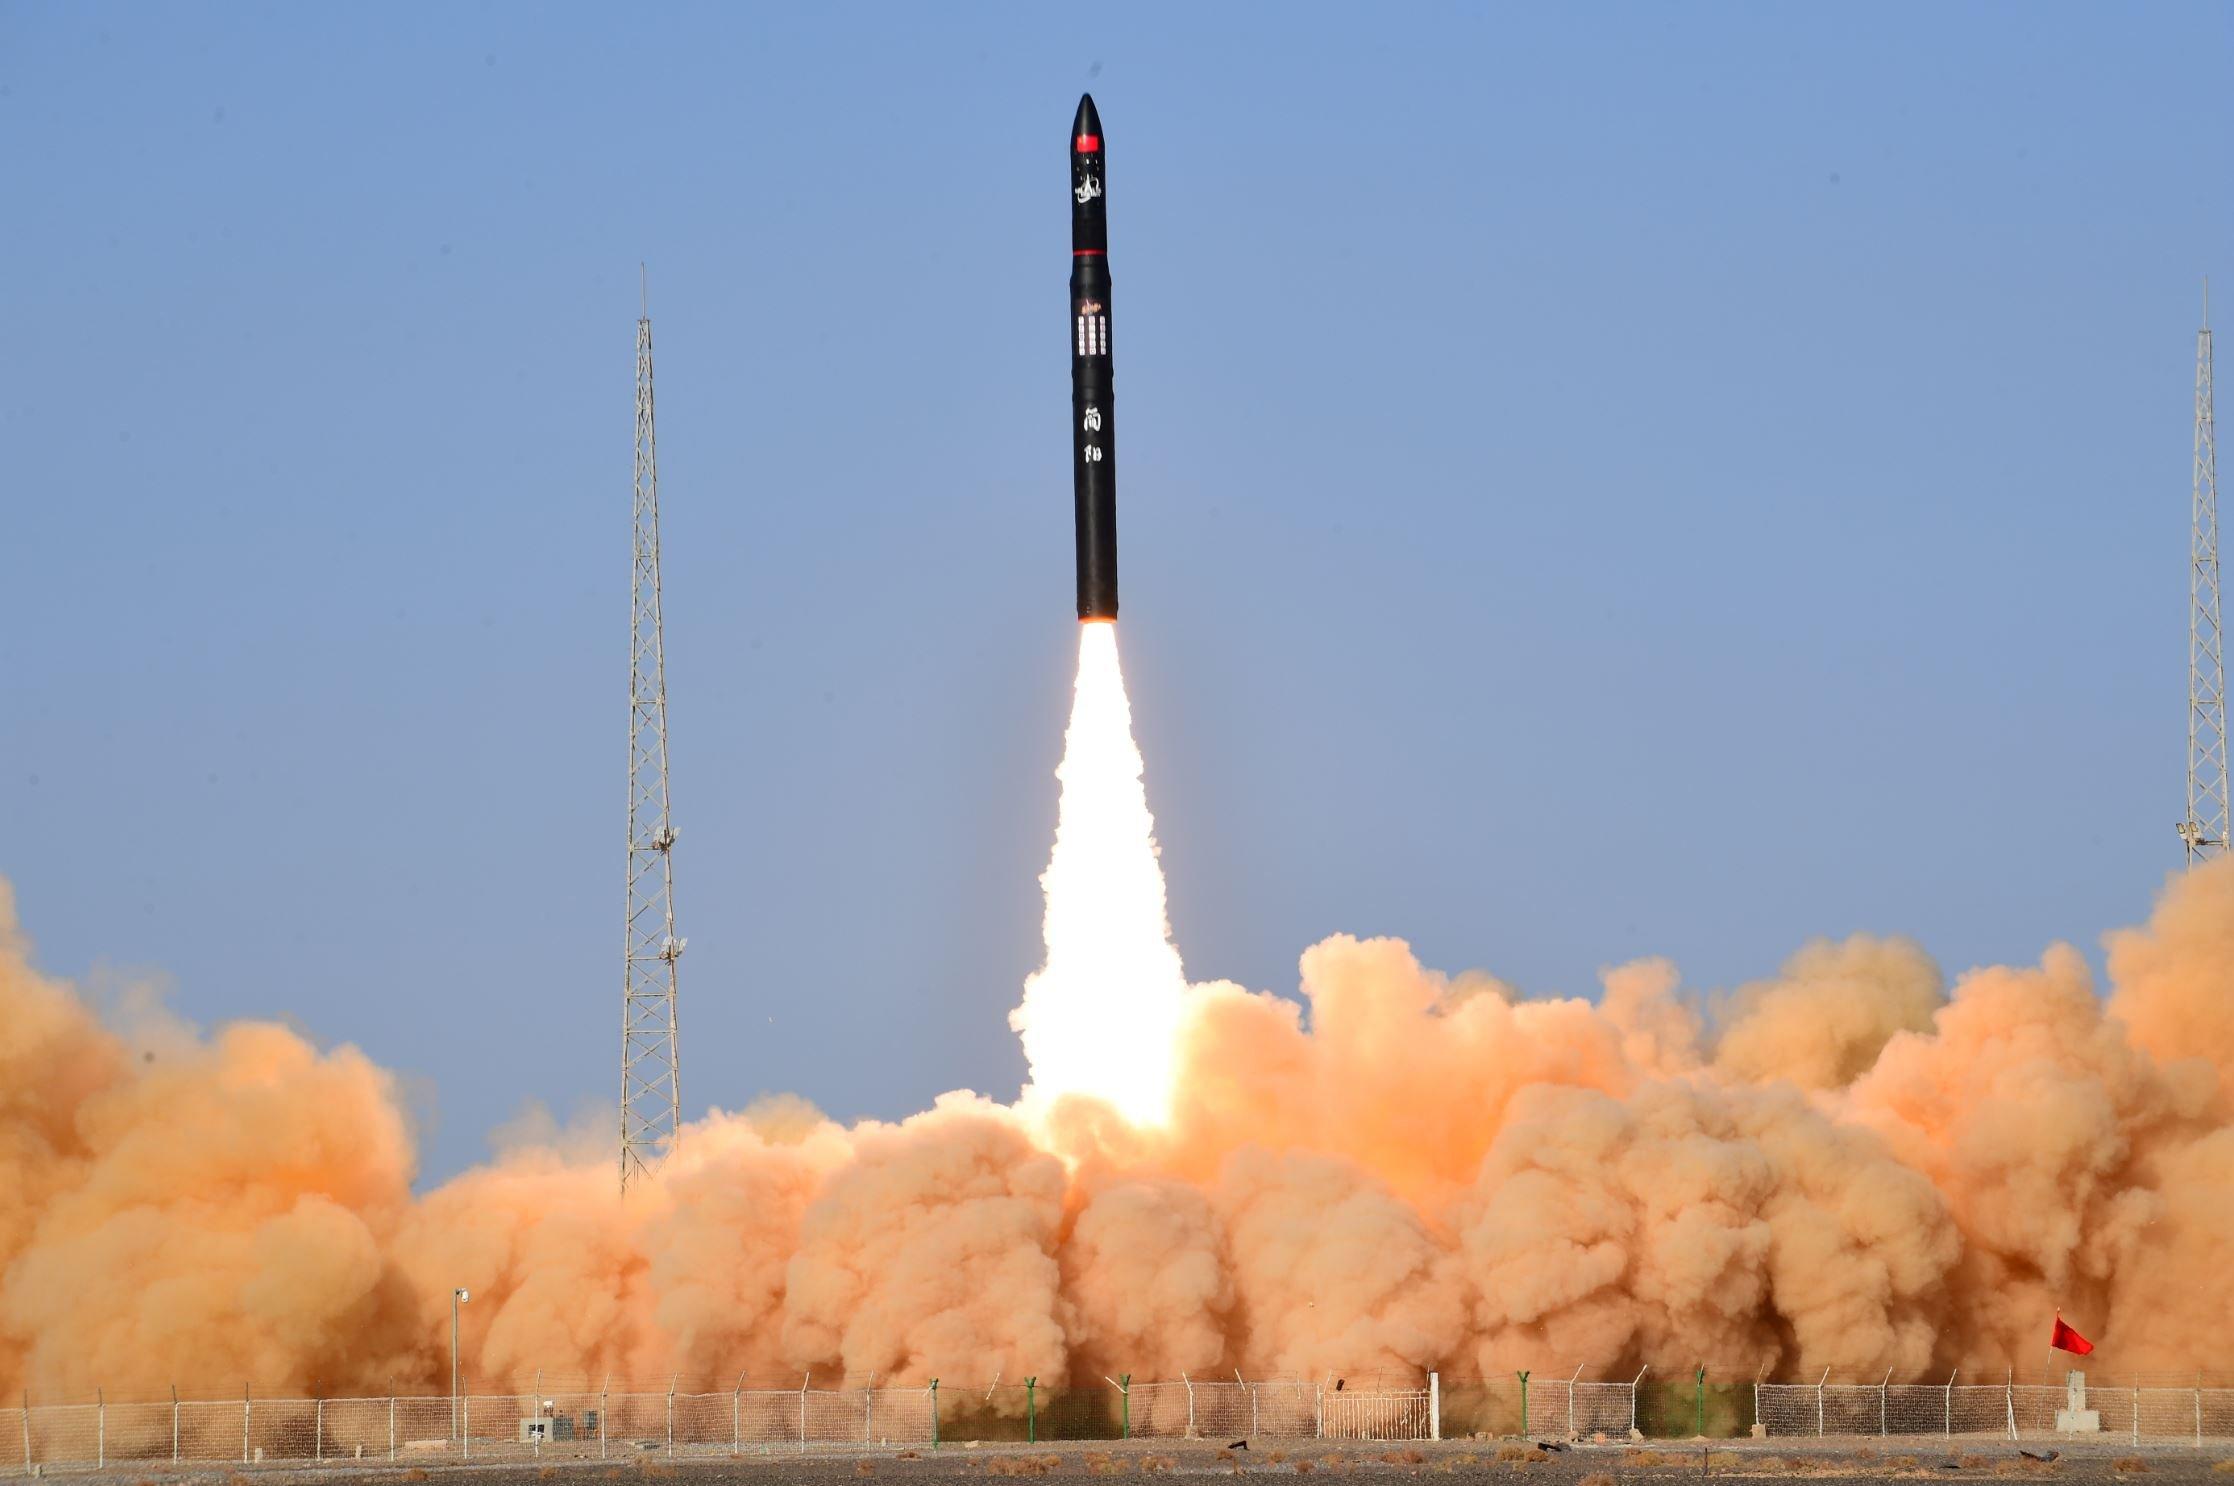 پرتاب موشک سرس-1 گلکتیک انرژی چین